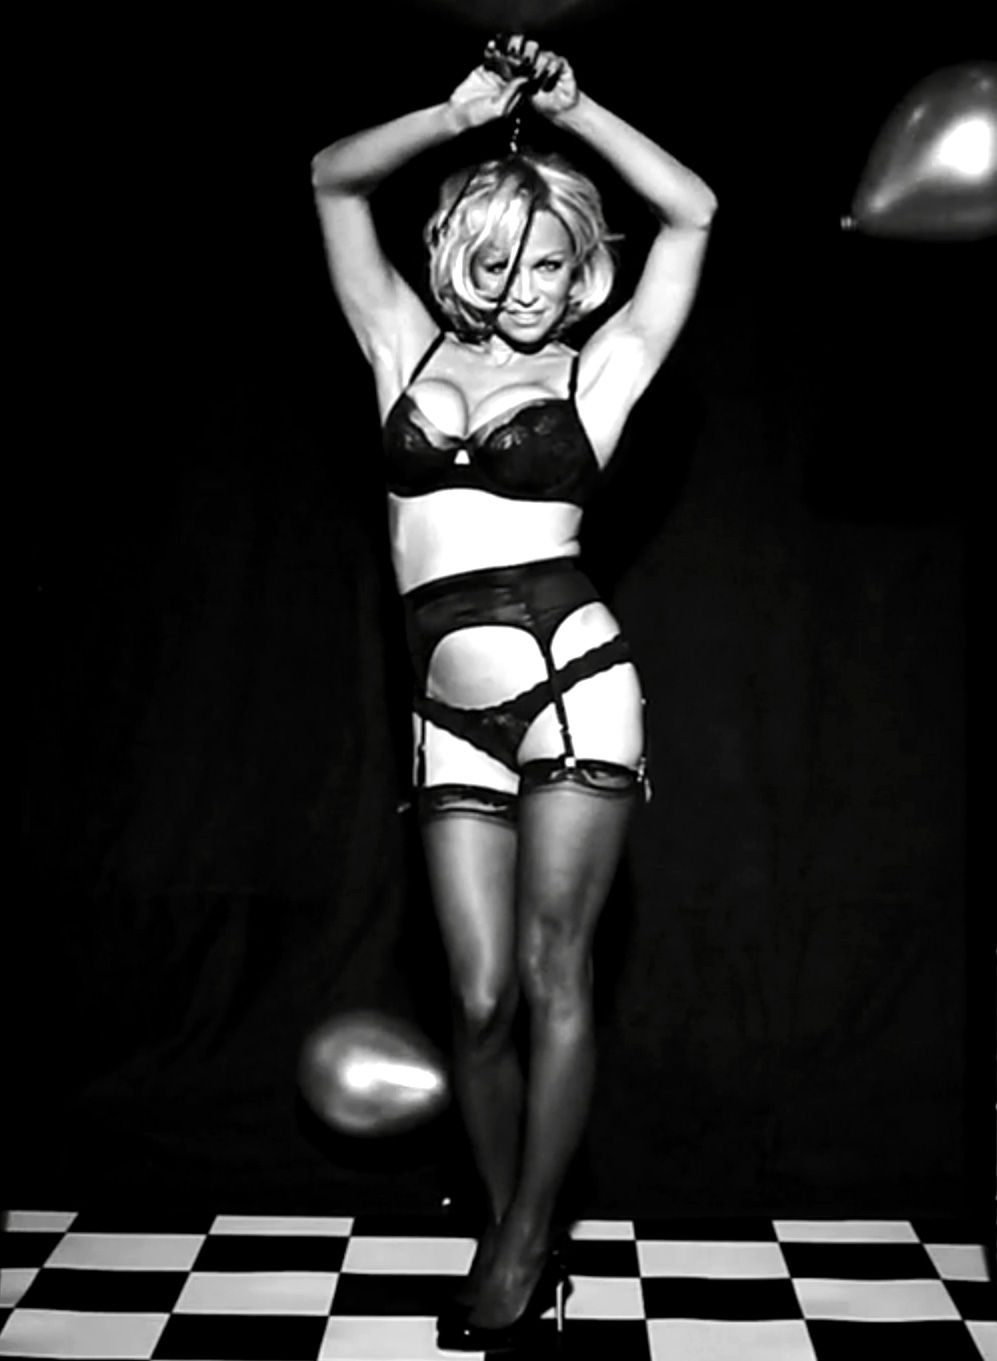 Pamela Anderson LOVE Advent 2014 nudes (97 photo), Ass Celebrity pic